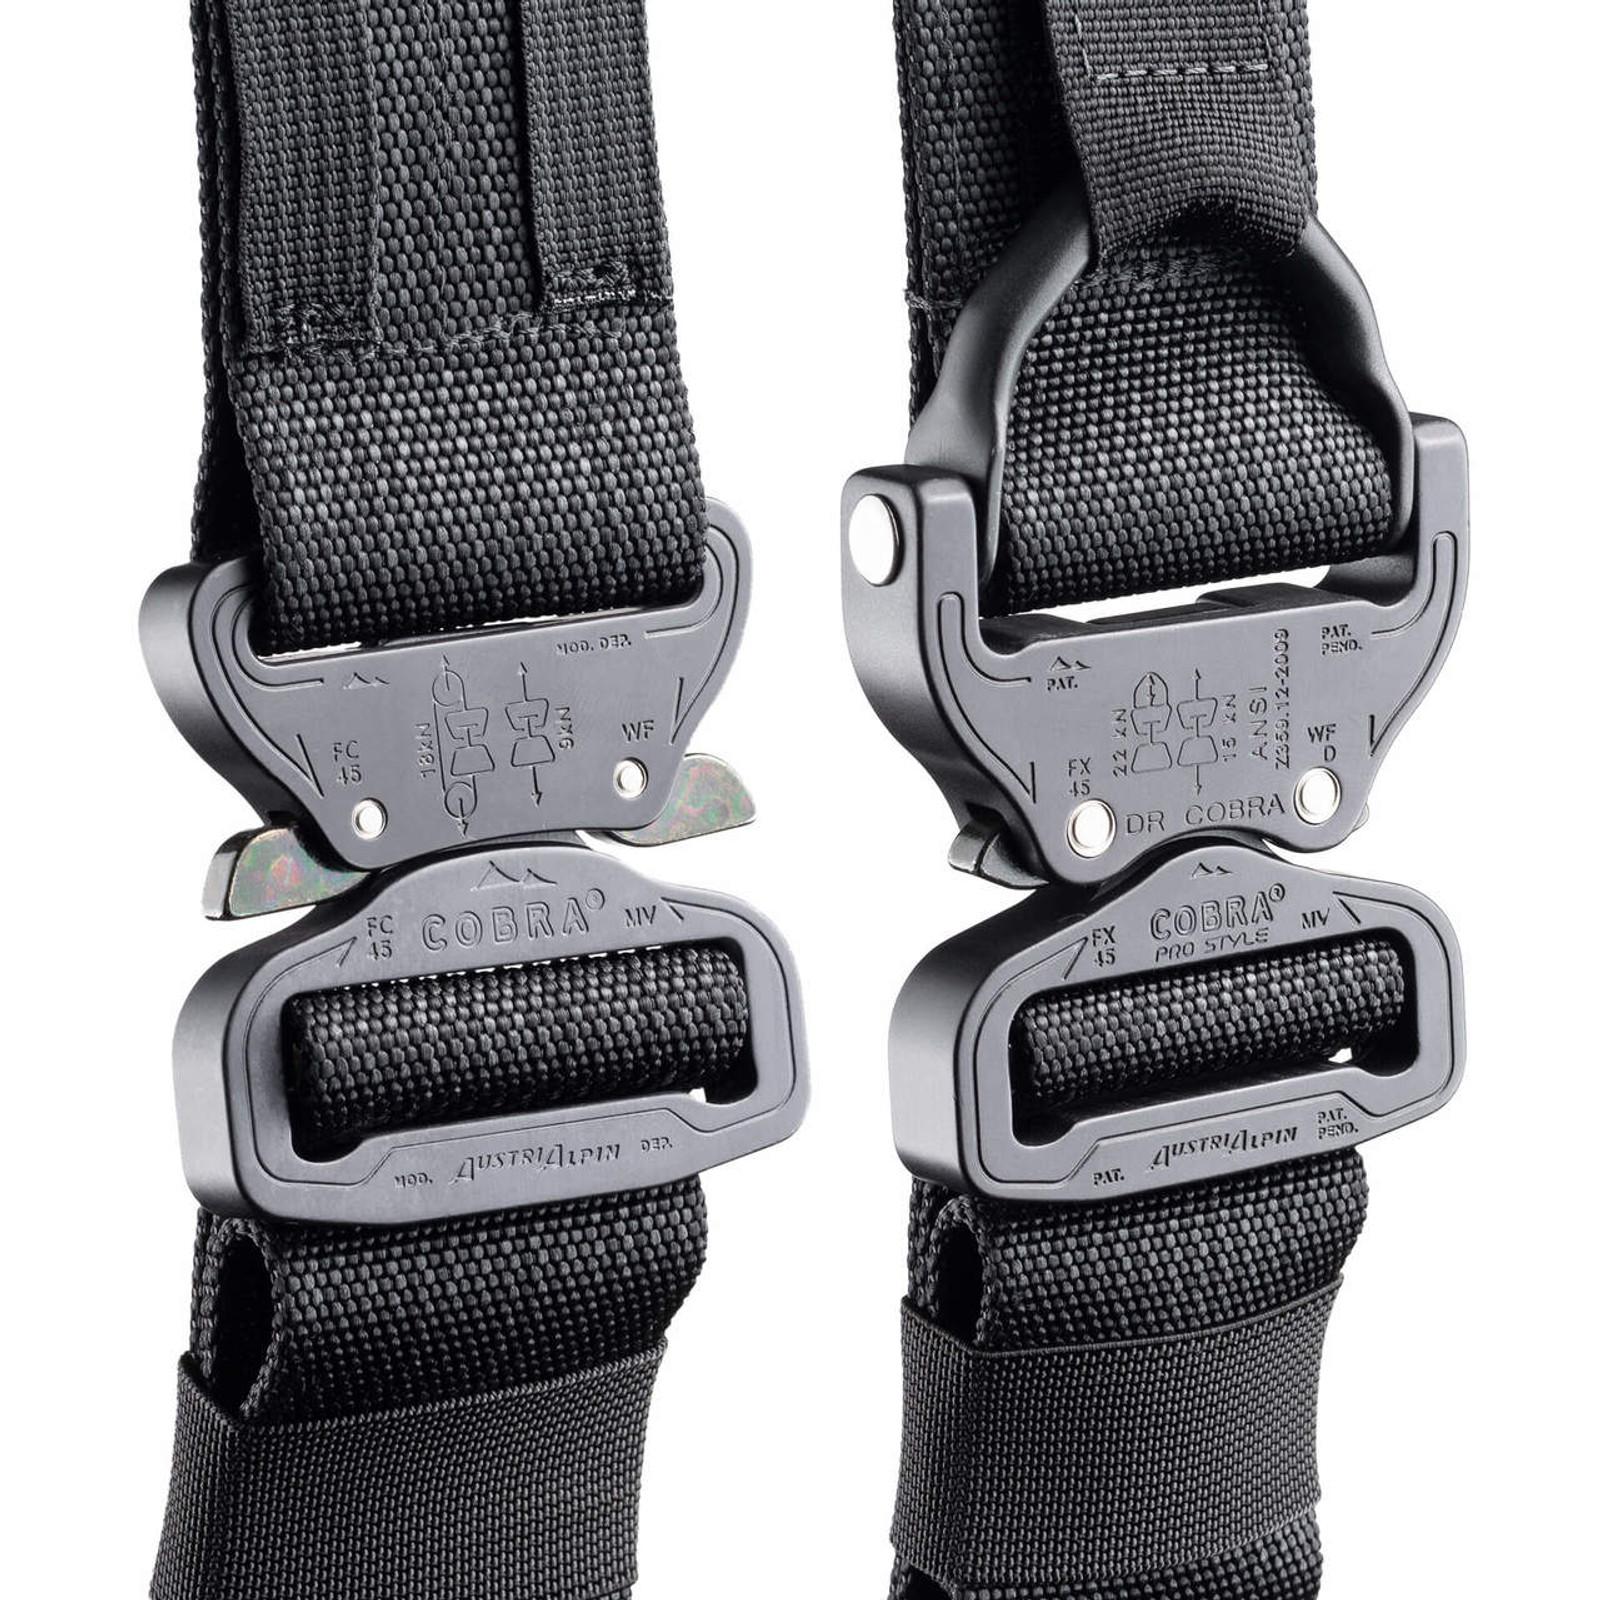 Standard Double Belt Rig